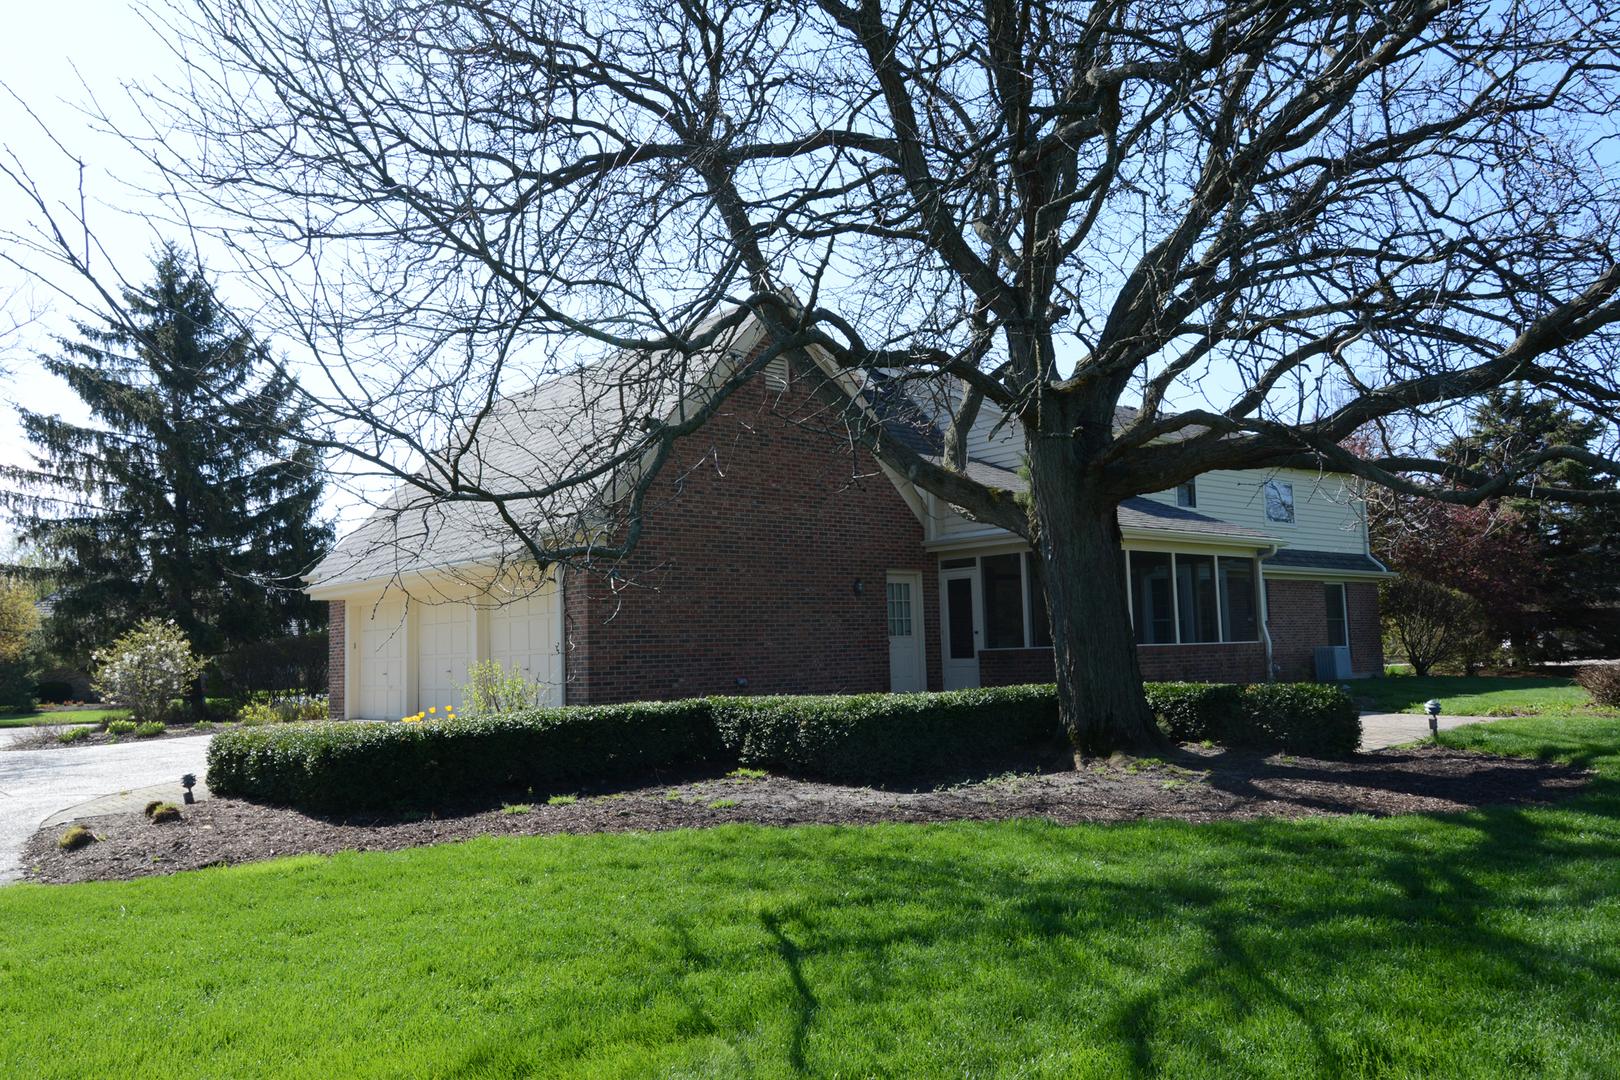 1275 Persimmon, St. Charles, Illinois, 60174